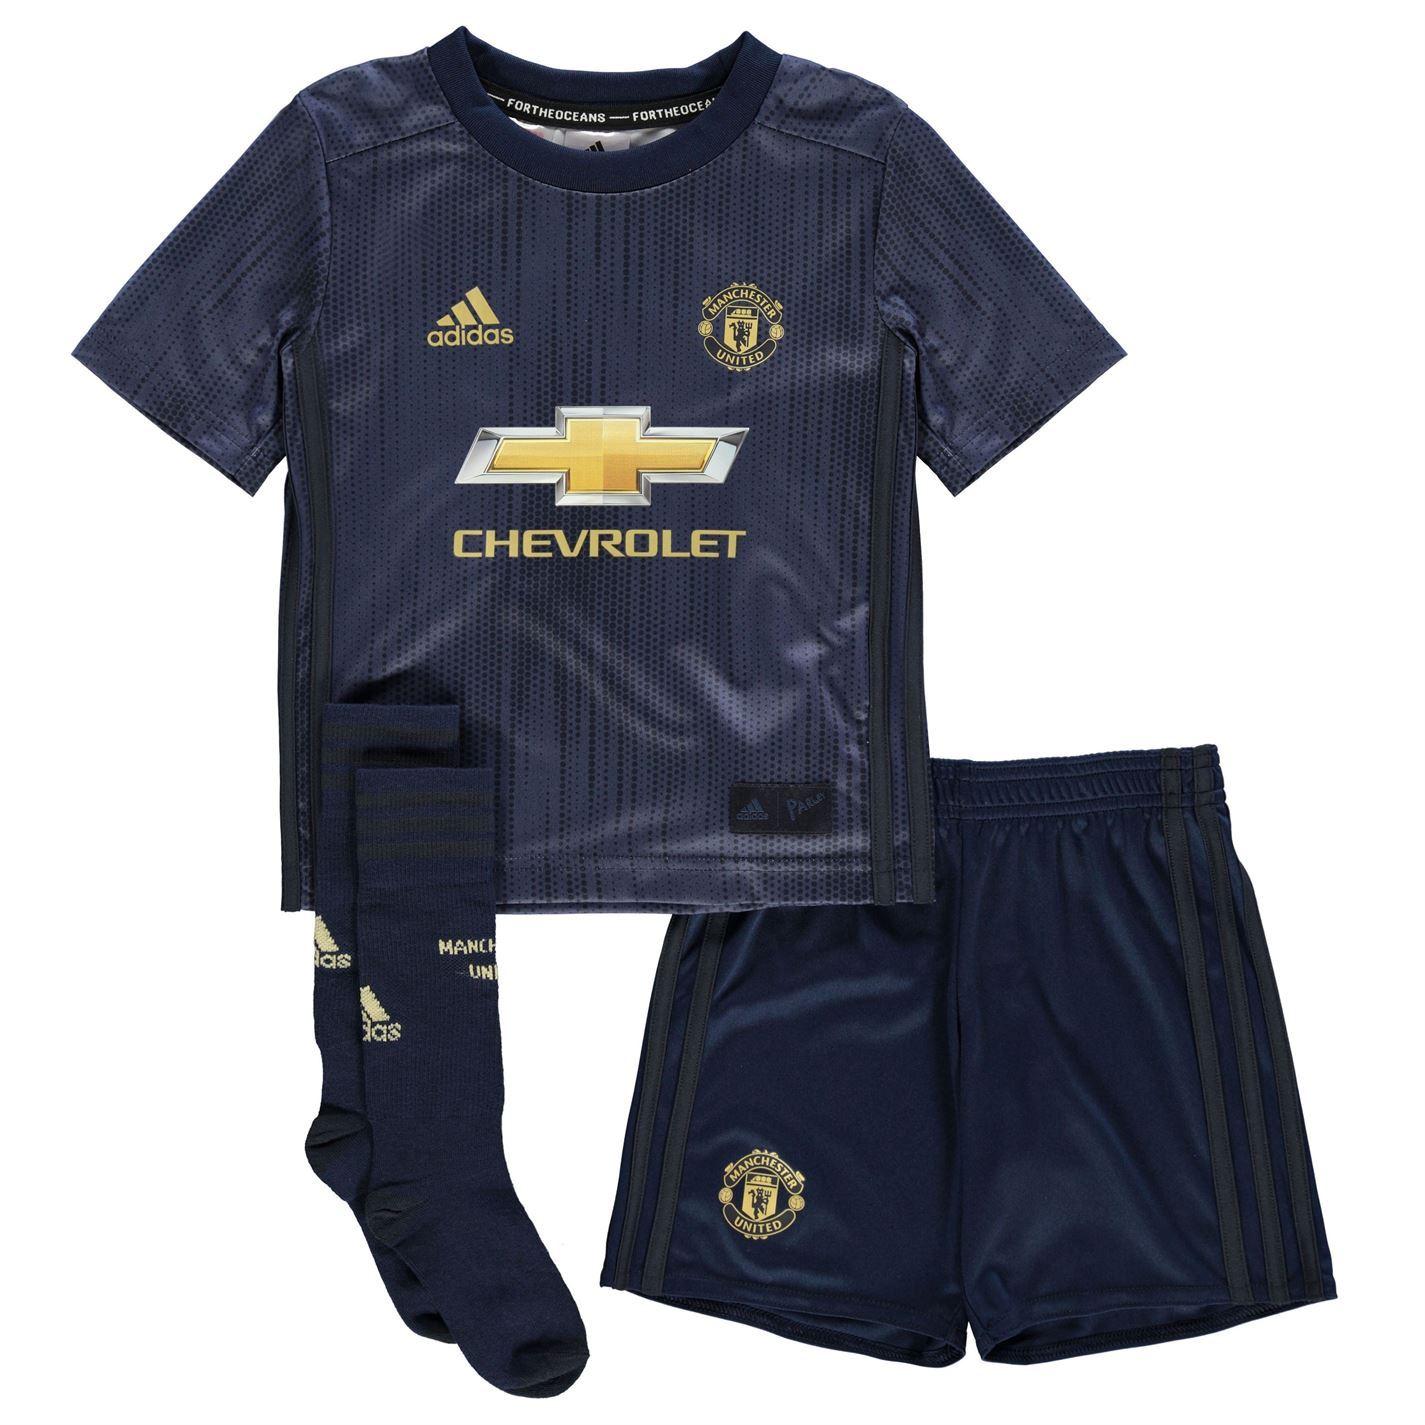 60c4179c adidas Manchester United 3rd Mini Kit 2018-19 Infants Navy Football Soccer  Strip